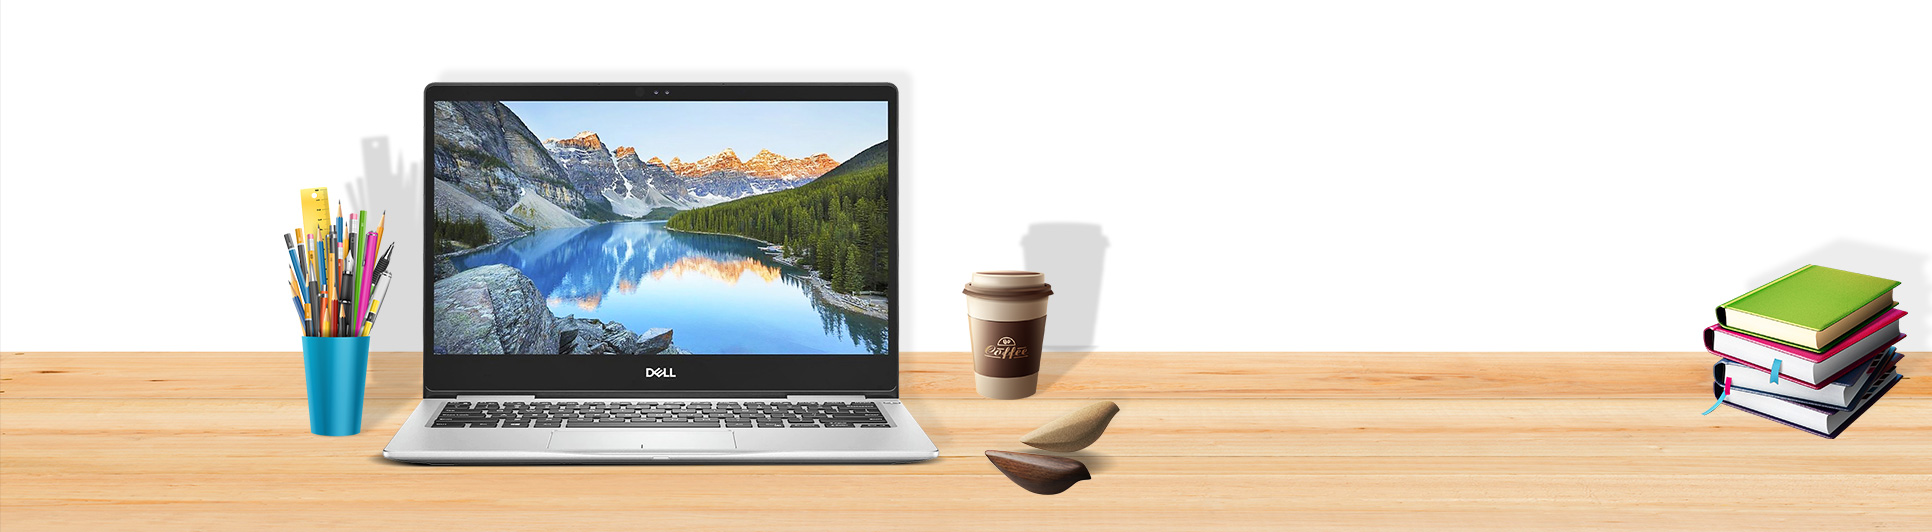 Laptop Dell Inspiron 13 7373 (C3TI501OW) thuộc dòng laptop 2 trong 1